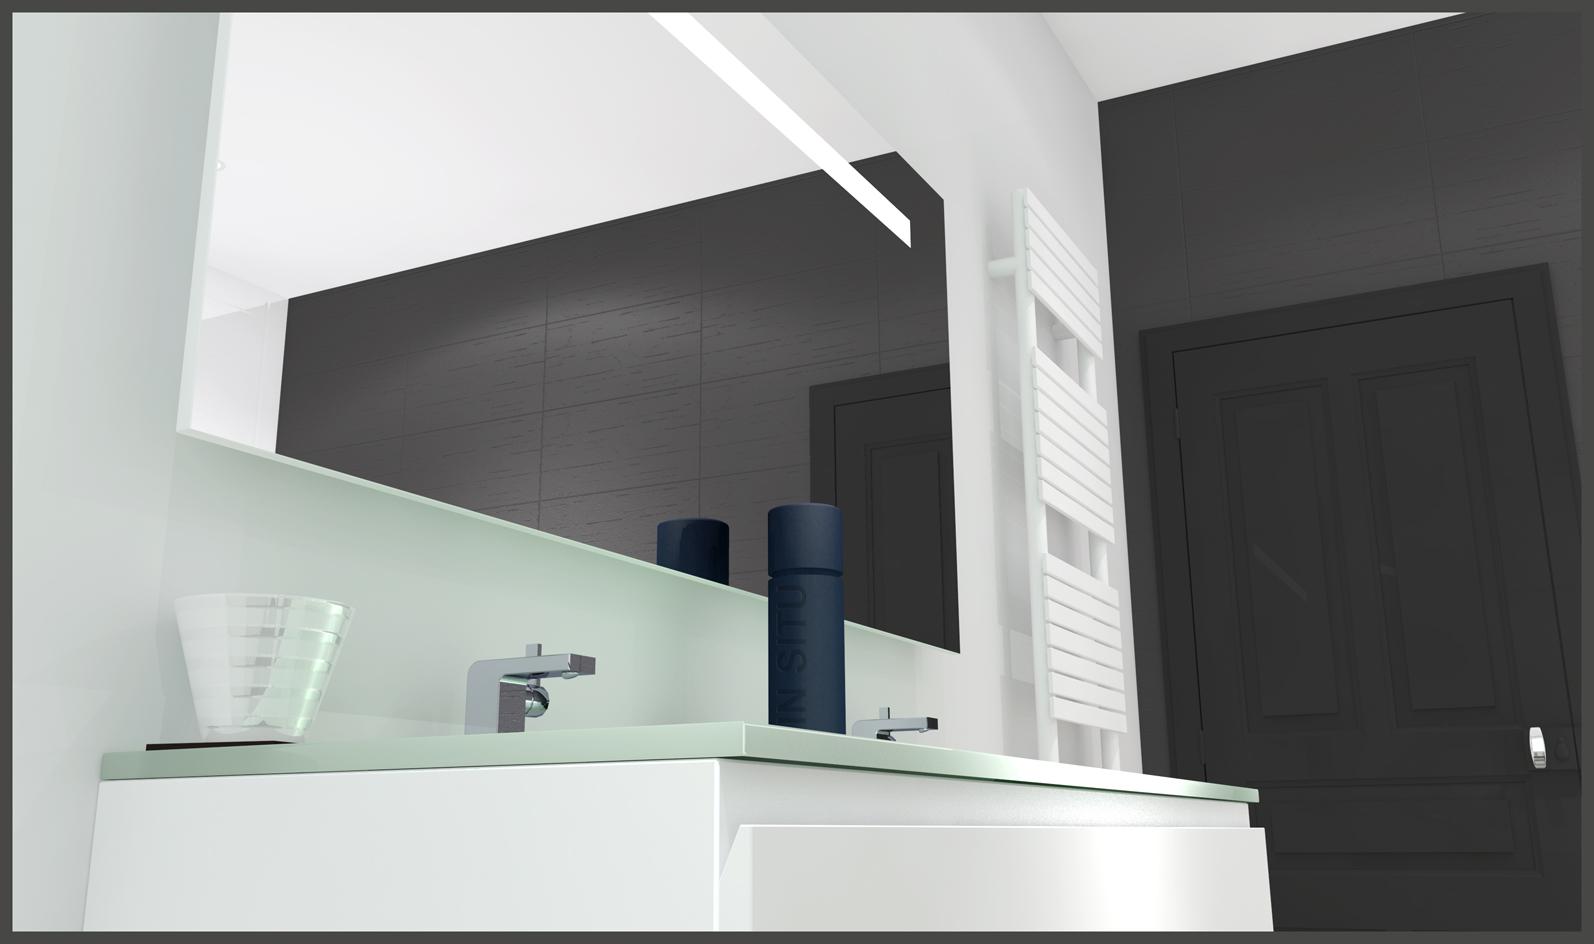 Conception 3d salle de bain akom design - Conception salle de bain 3d ...